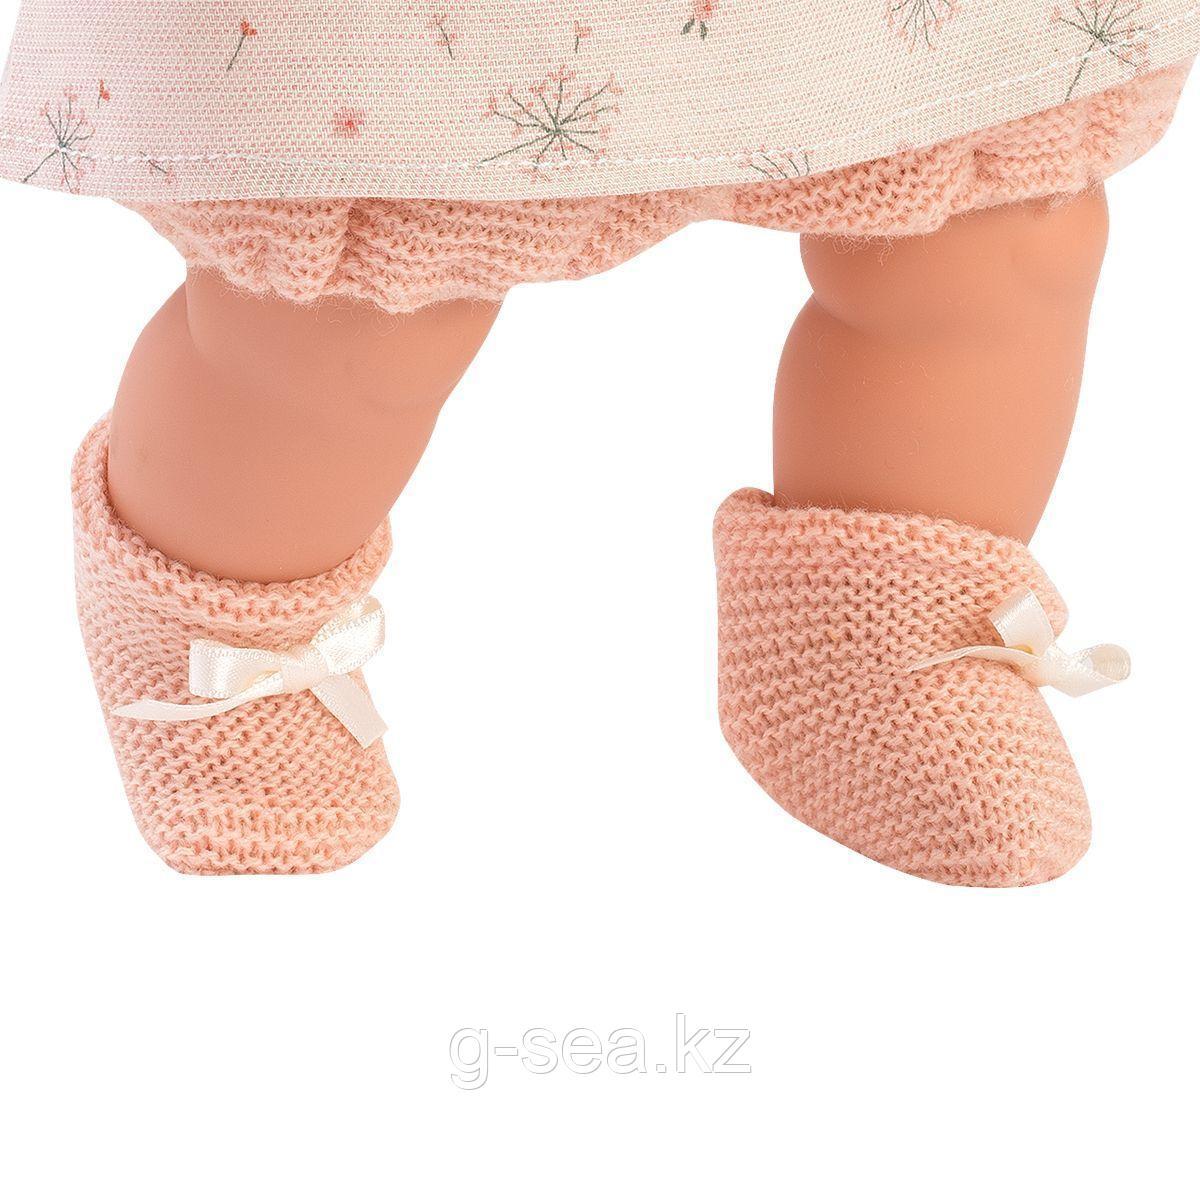 LLORENS: Кукла Рита 33 см., брюнетка в розовом жакете - фото 4